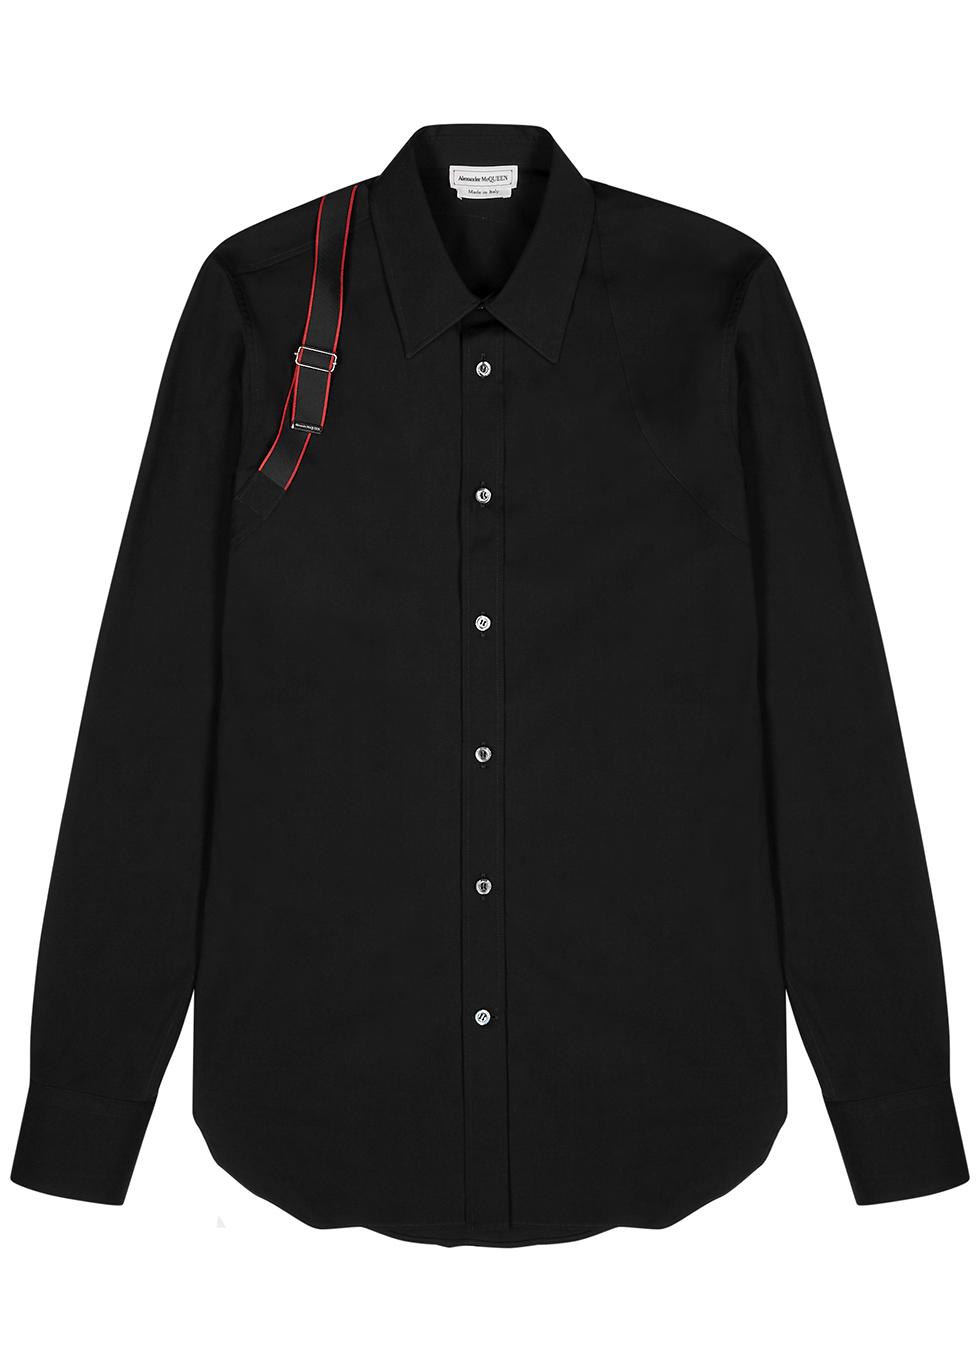 Black harness cotton shirt